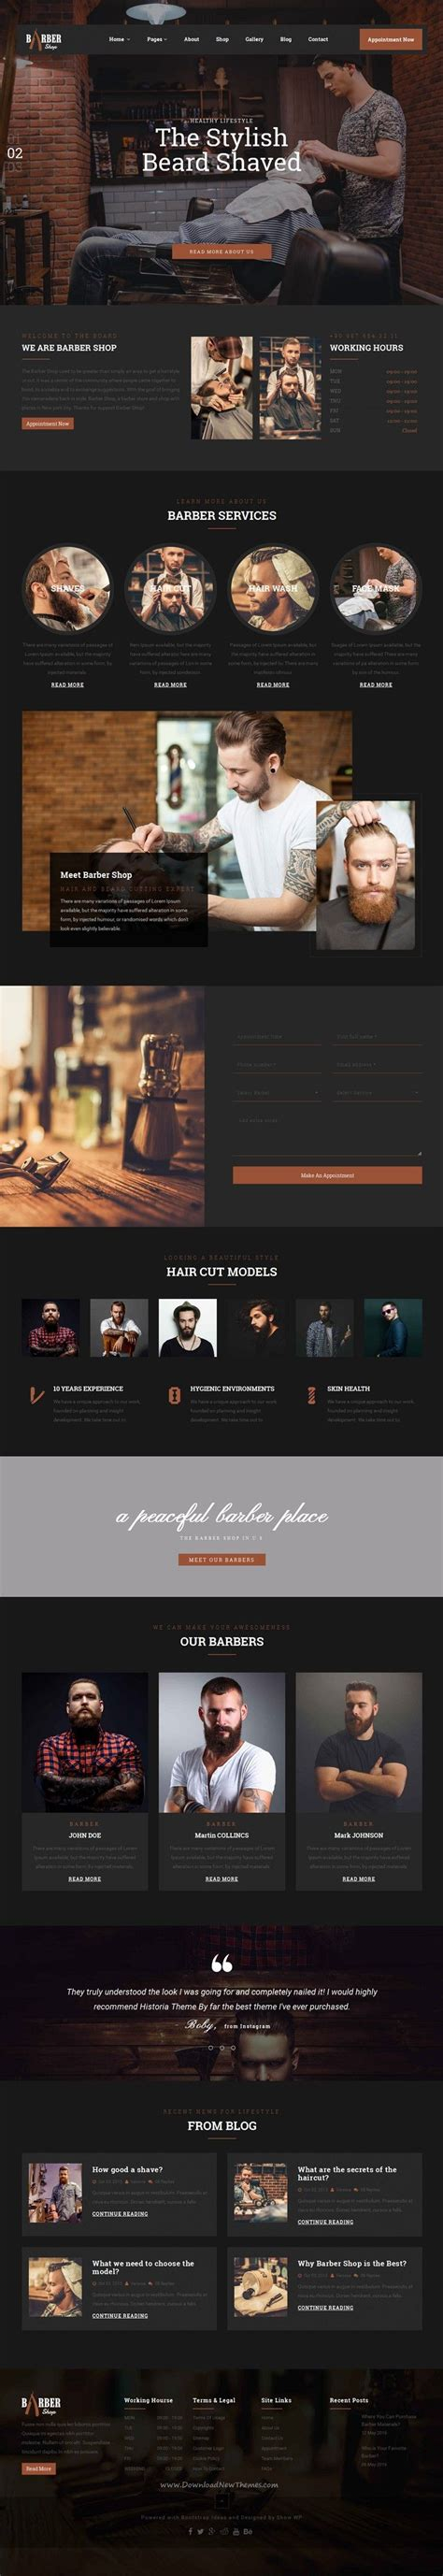 big salon beauty barber site template 25 best ideas about good hair salon on pinterest salon